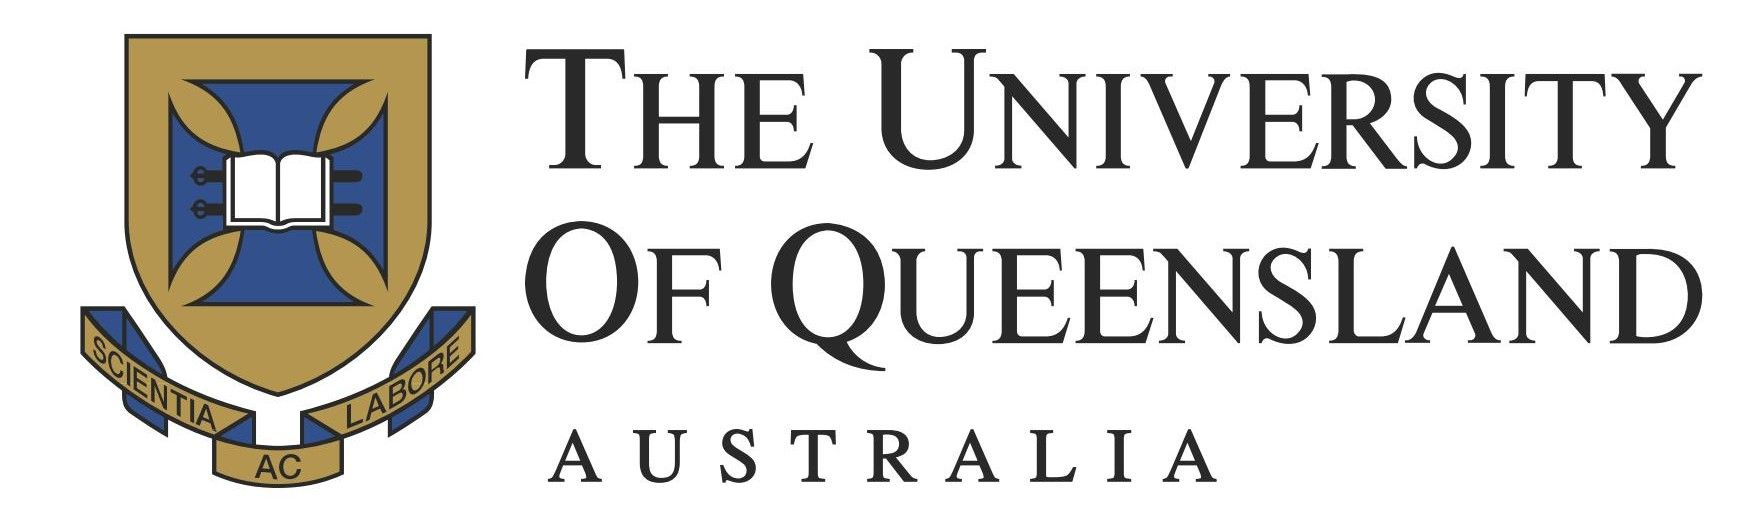 The University of Queensland (UQ) Logo [EPS File